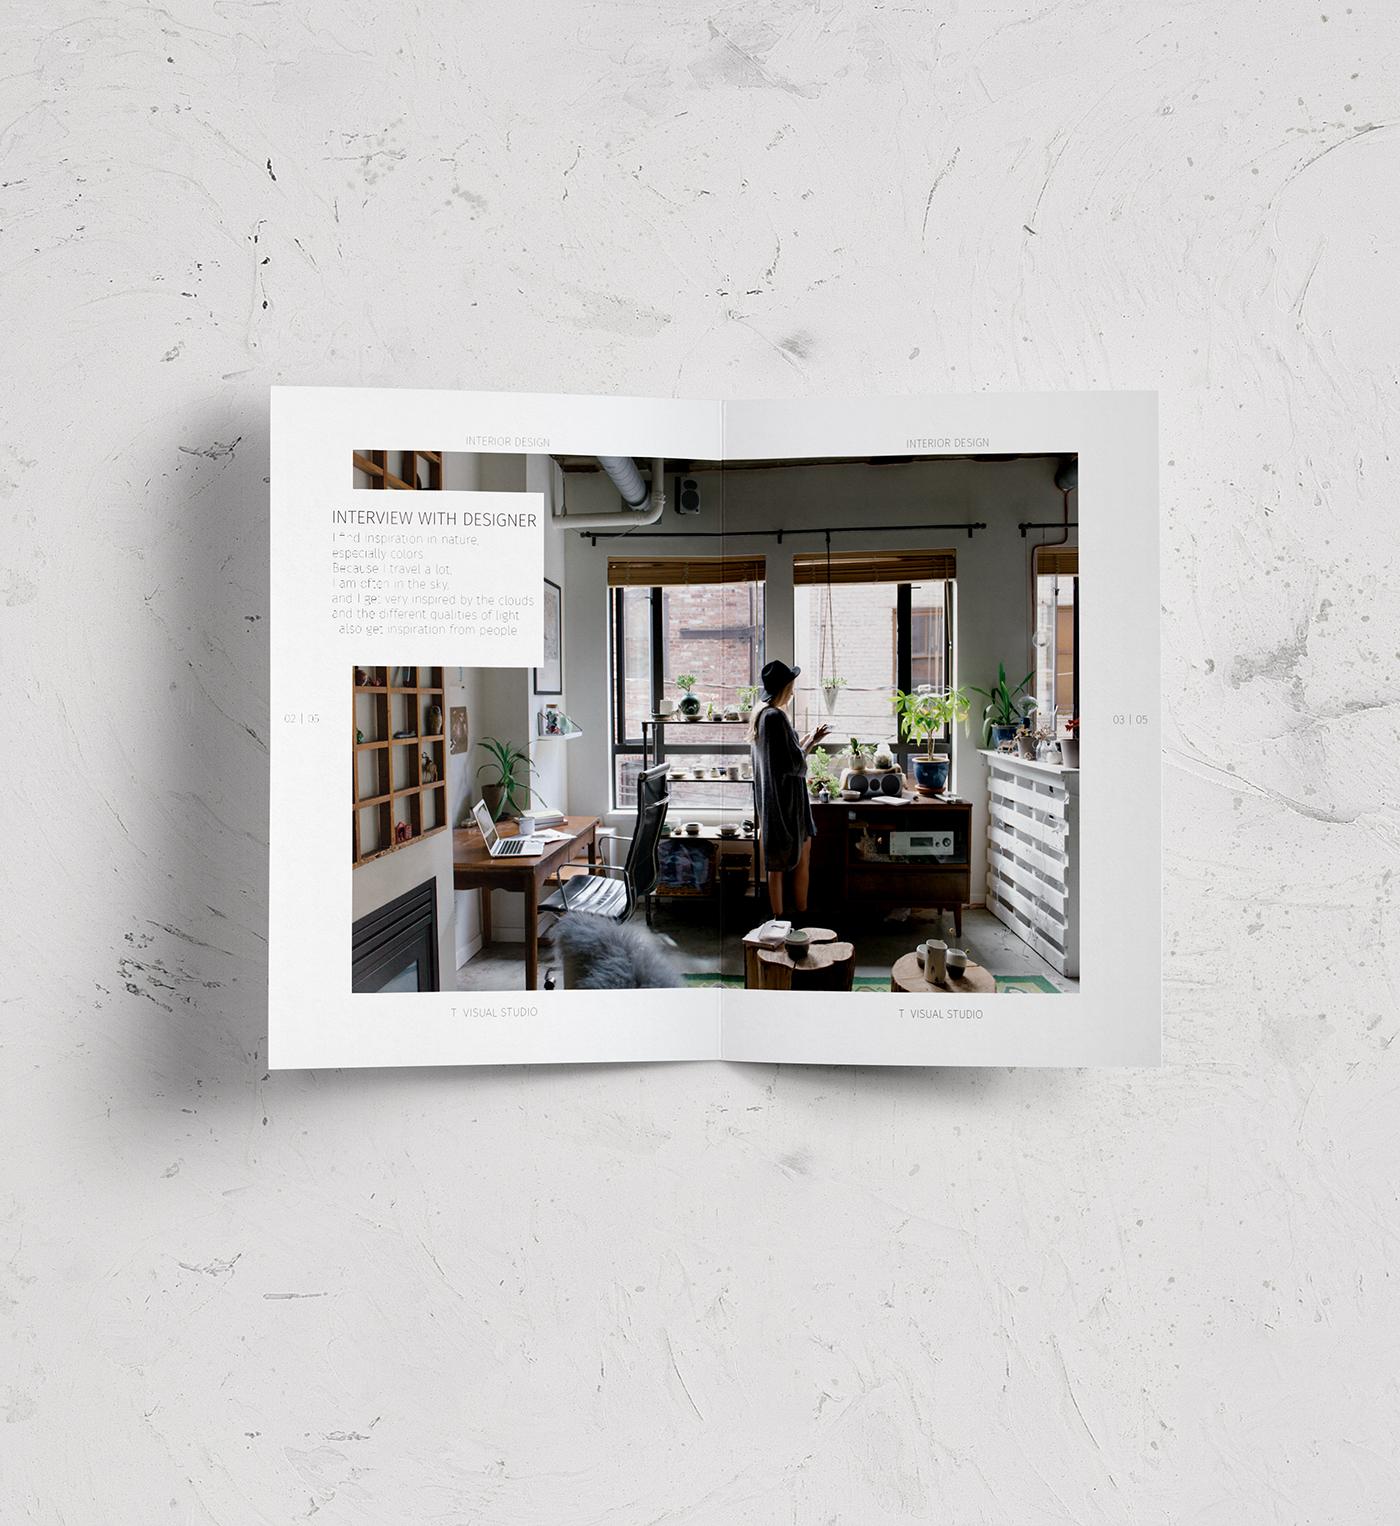 Lookbook For Interior Design On Behance